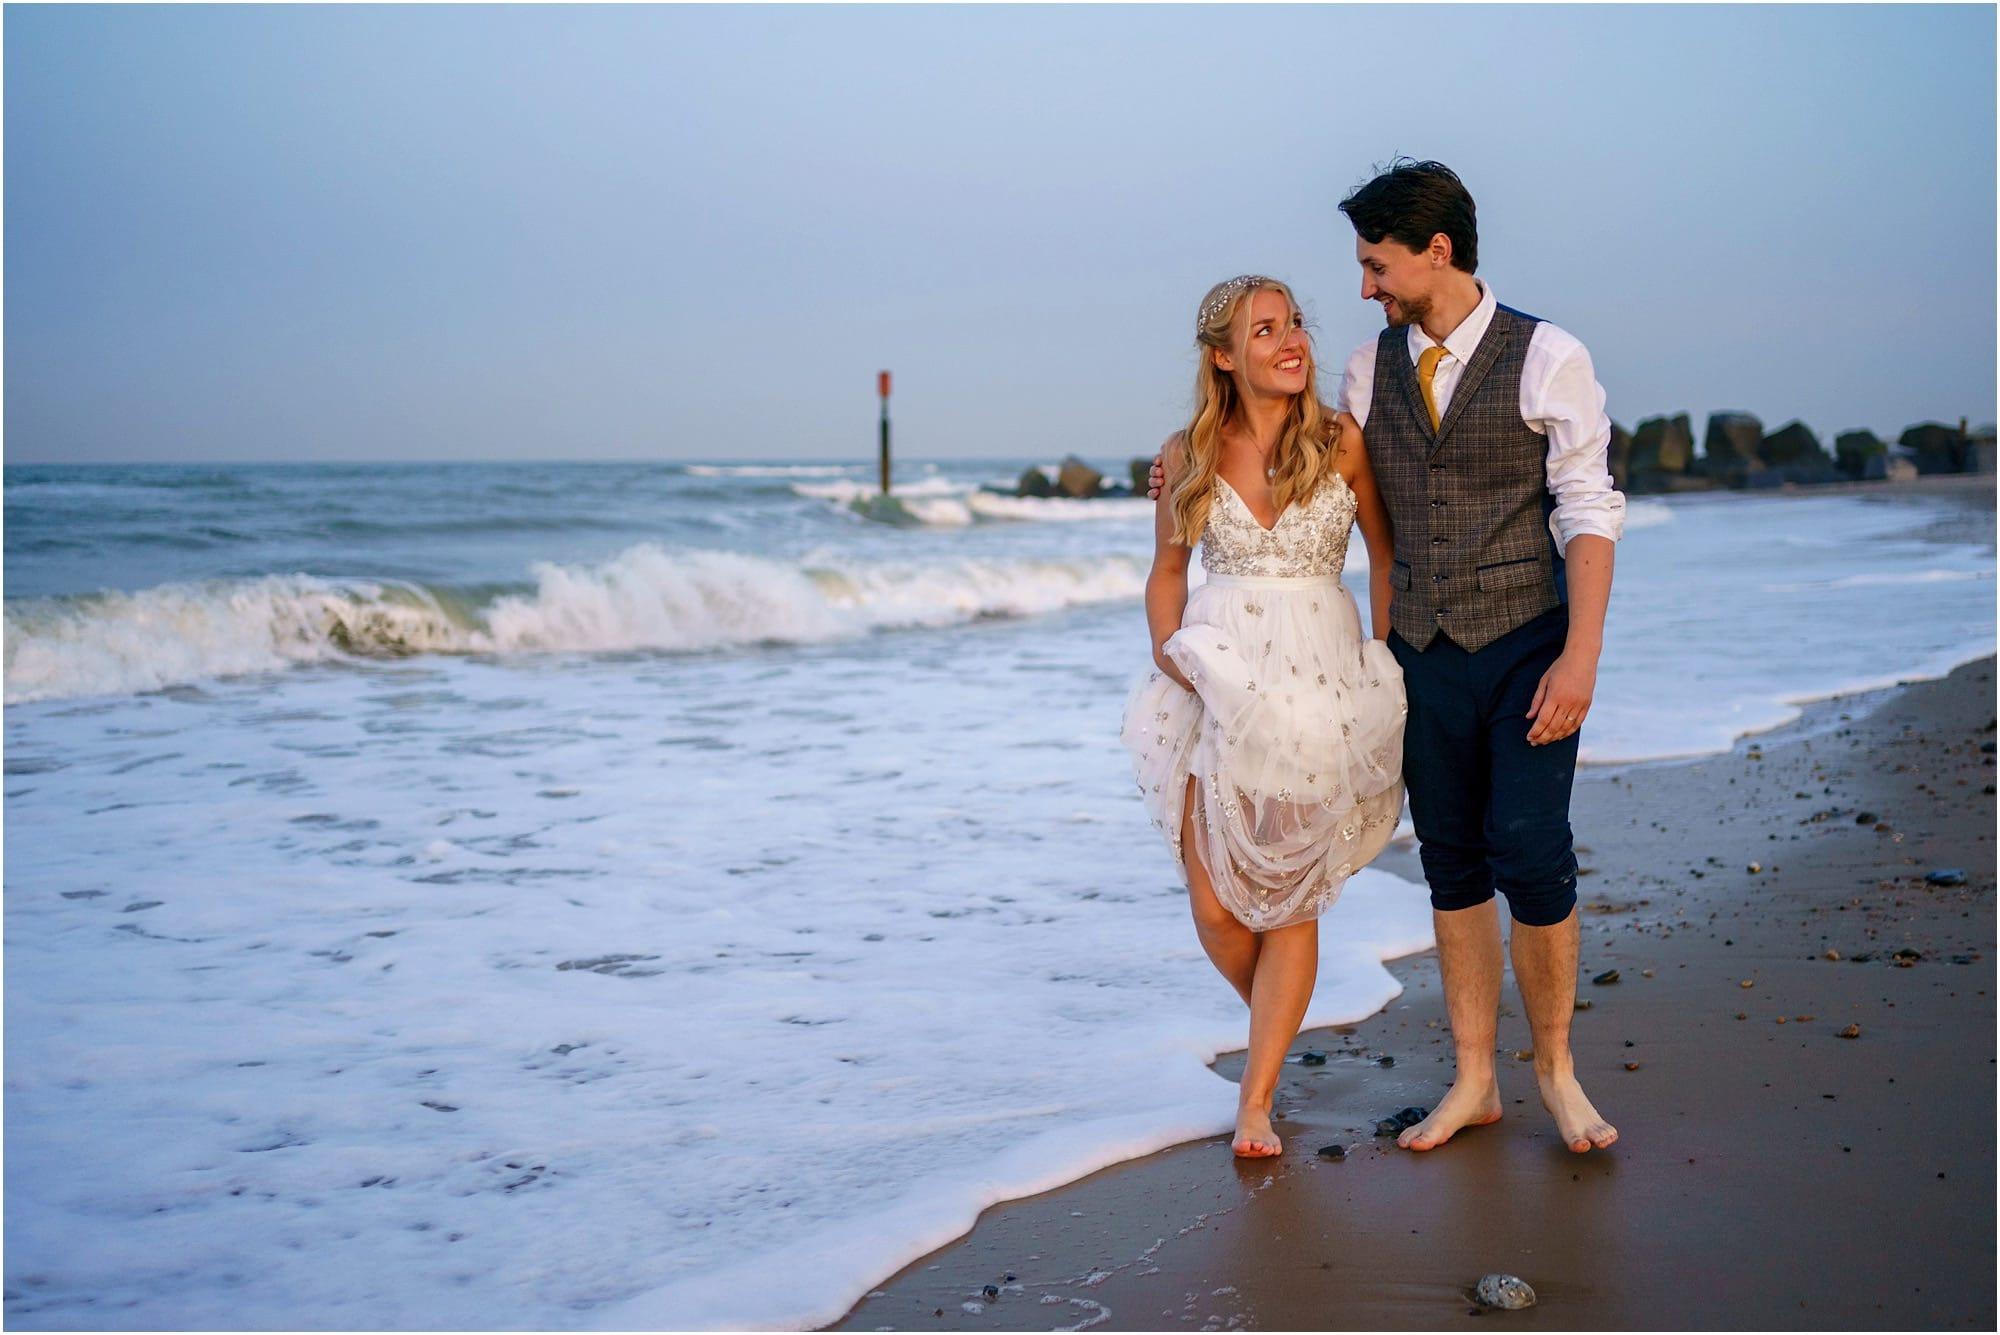 Waxham wedding beach photographer